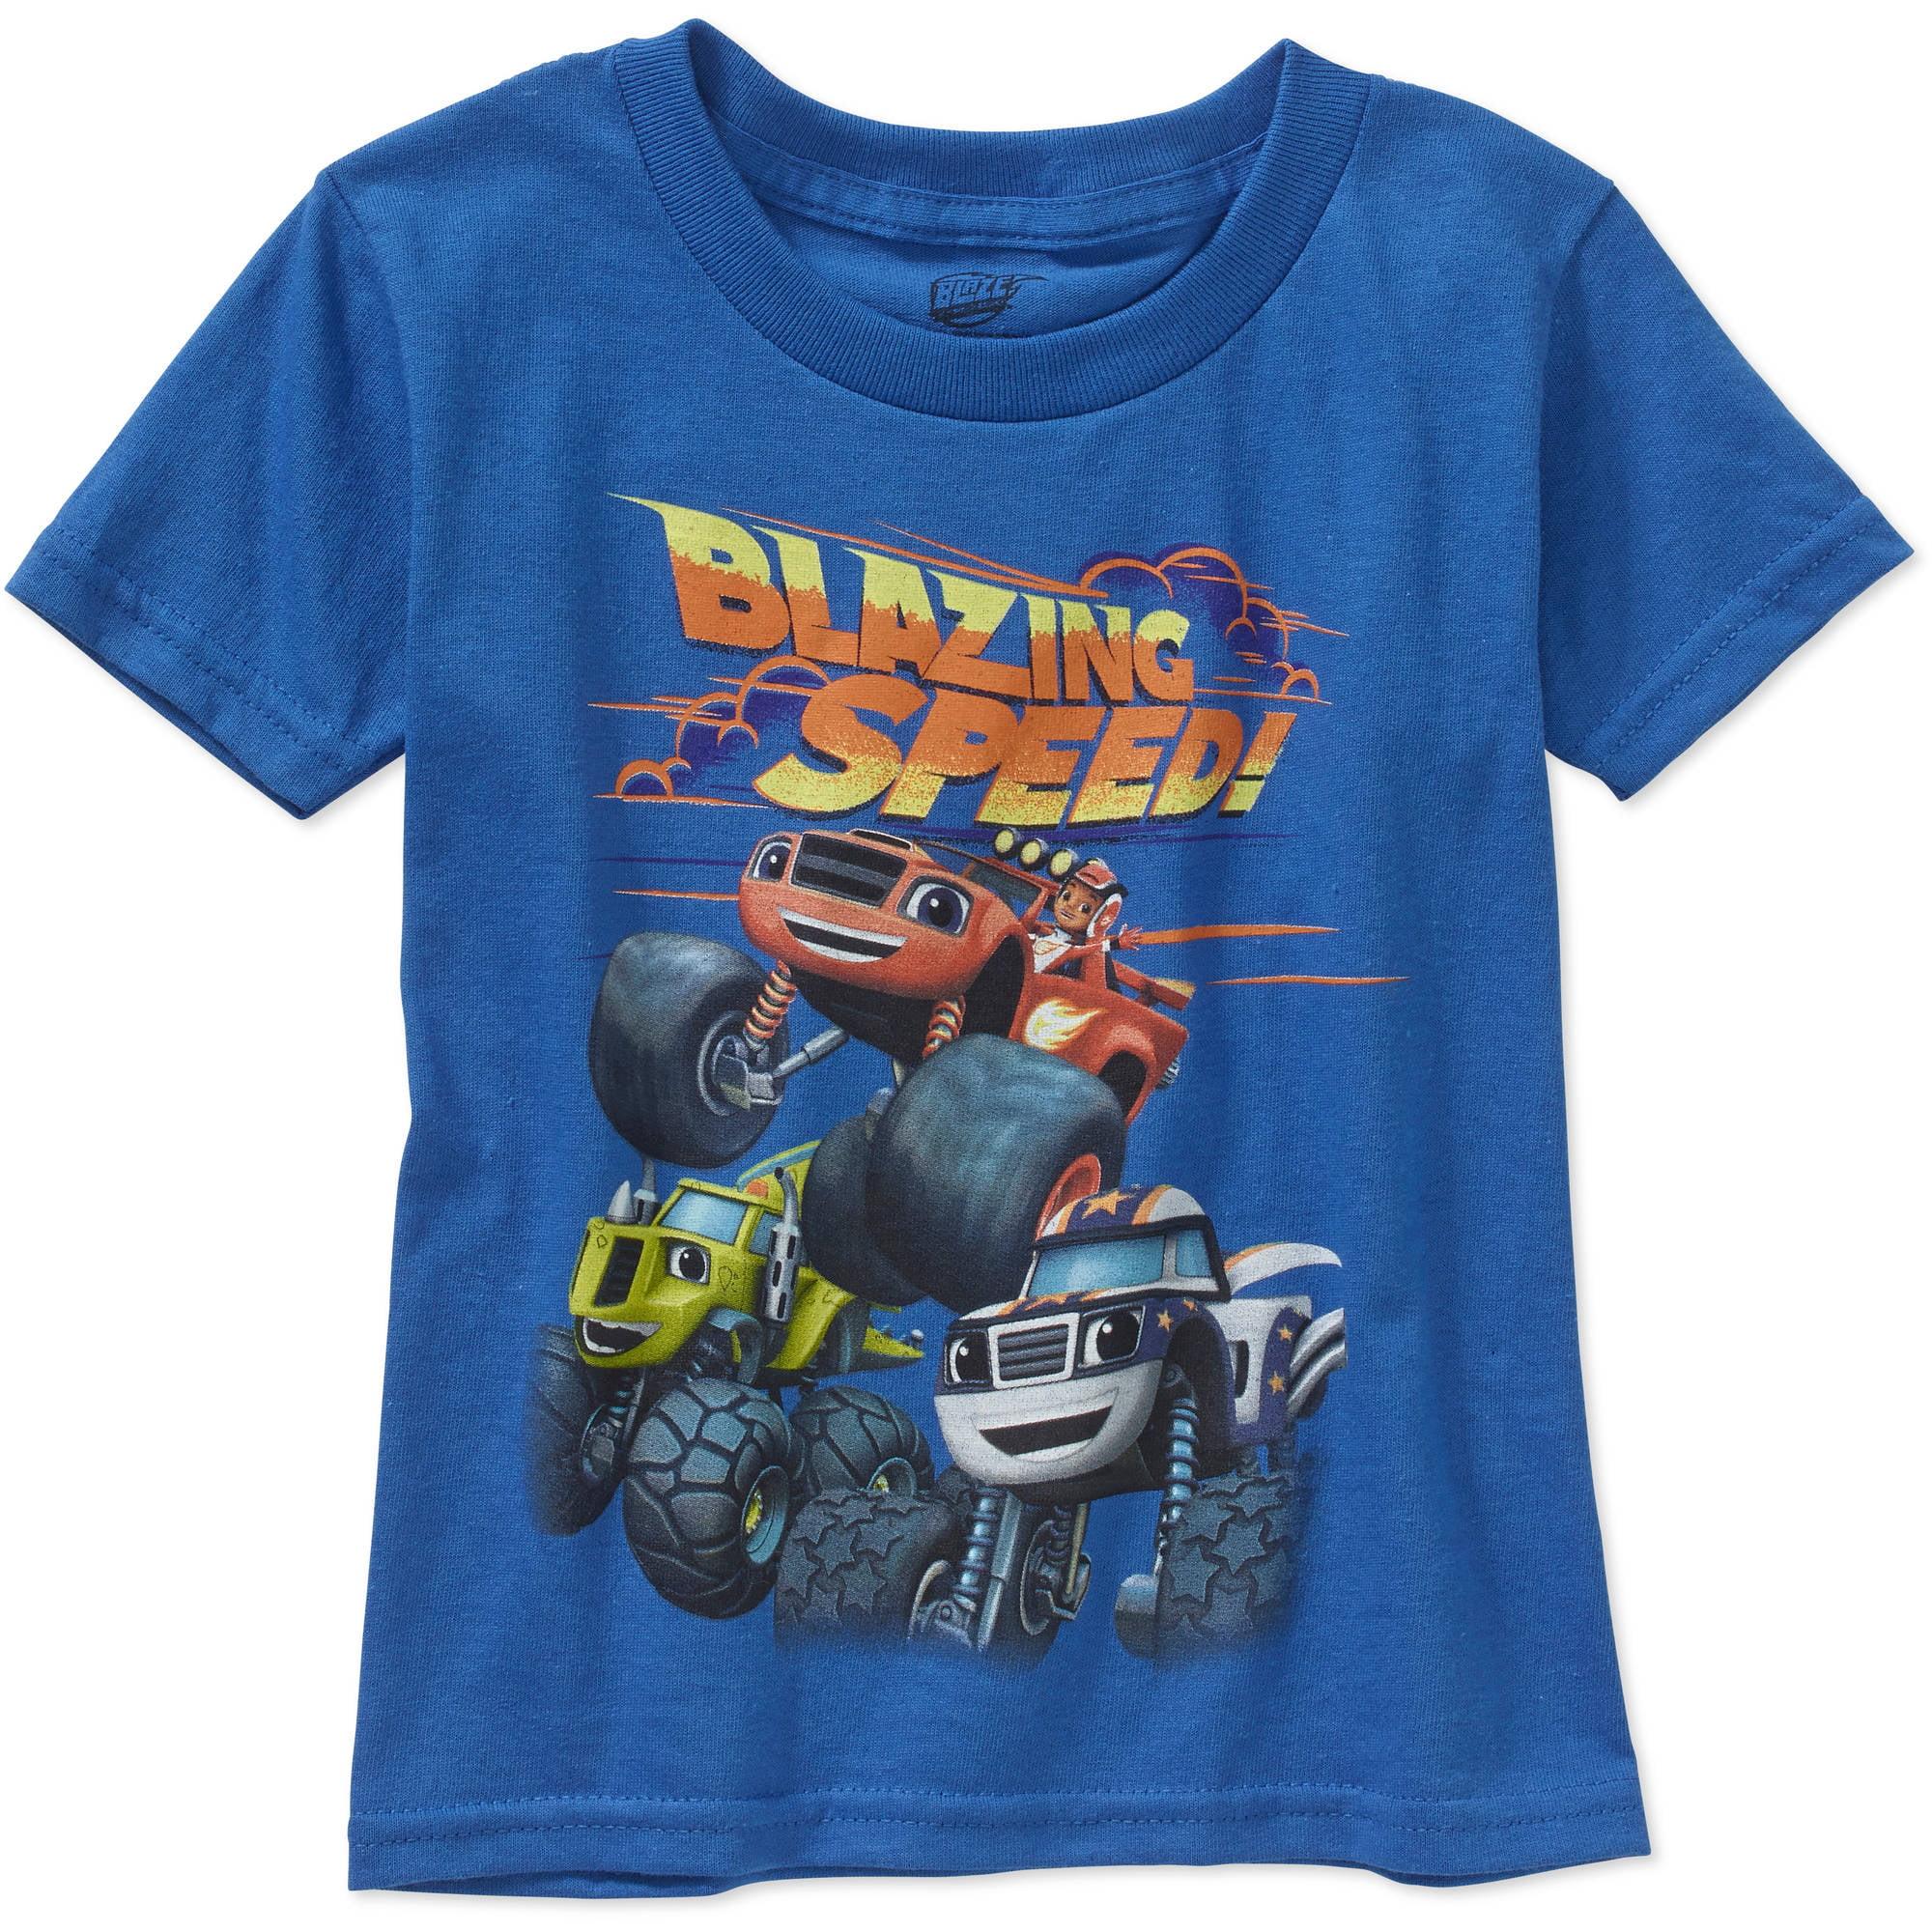 Nickelodeon Blaze Blazing Speed Toddler Boy Short Sleeve Graphic Tee